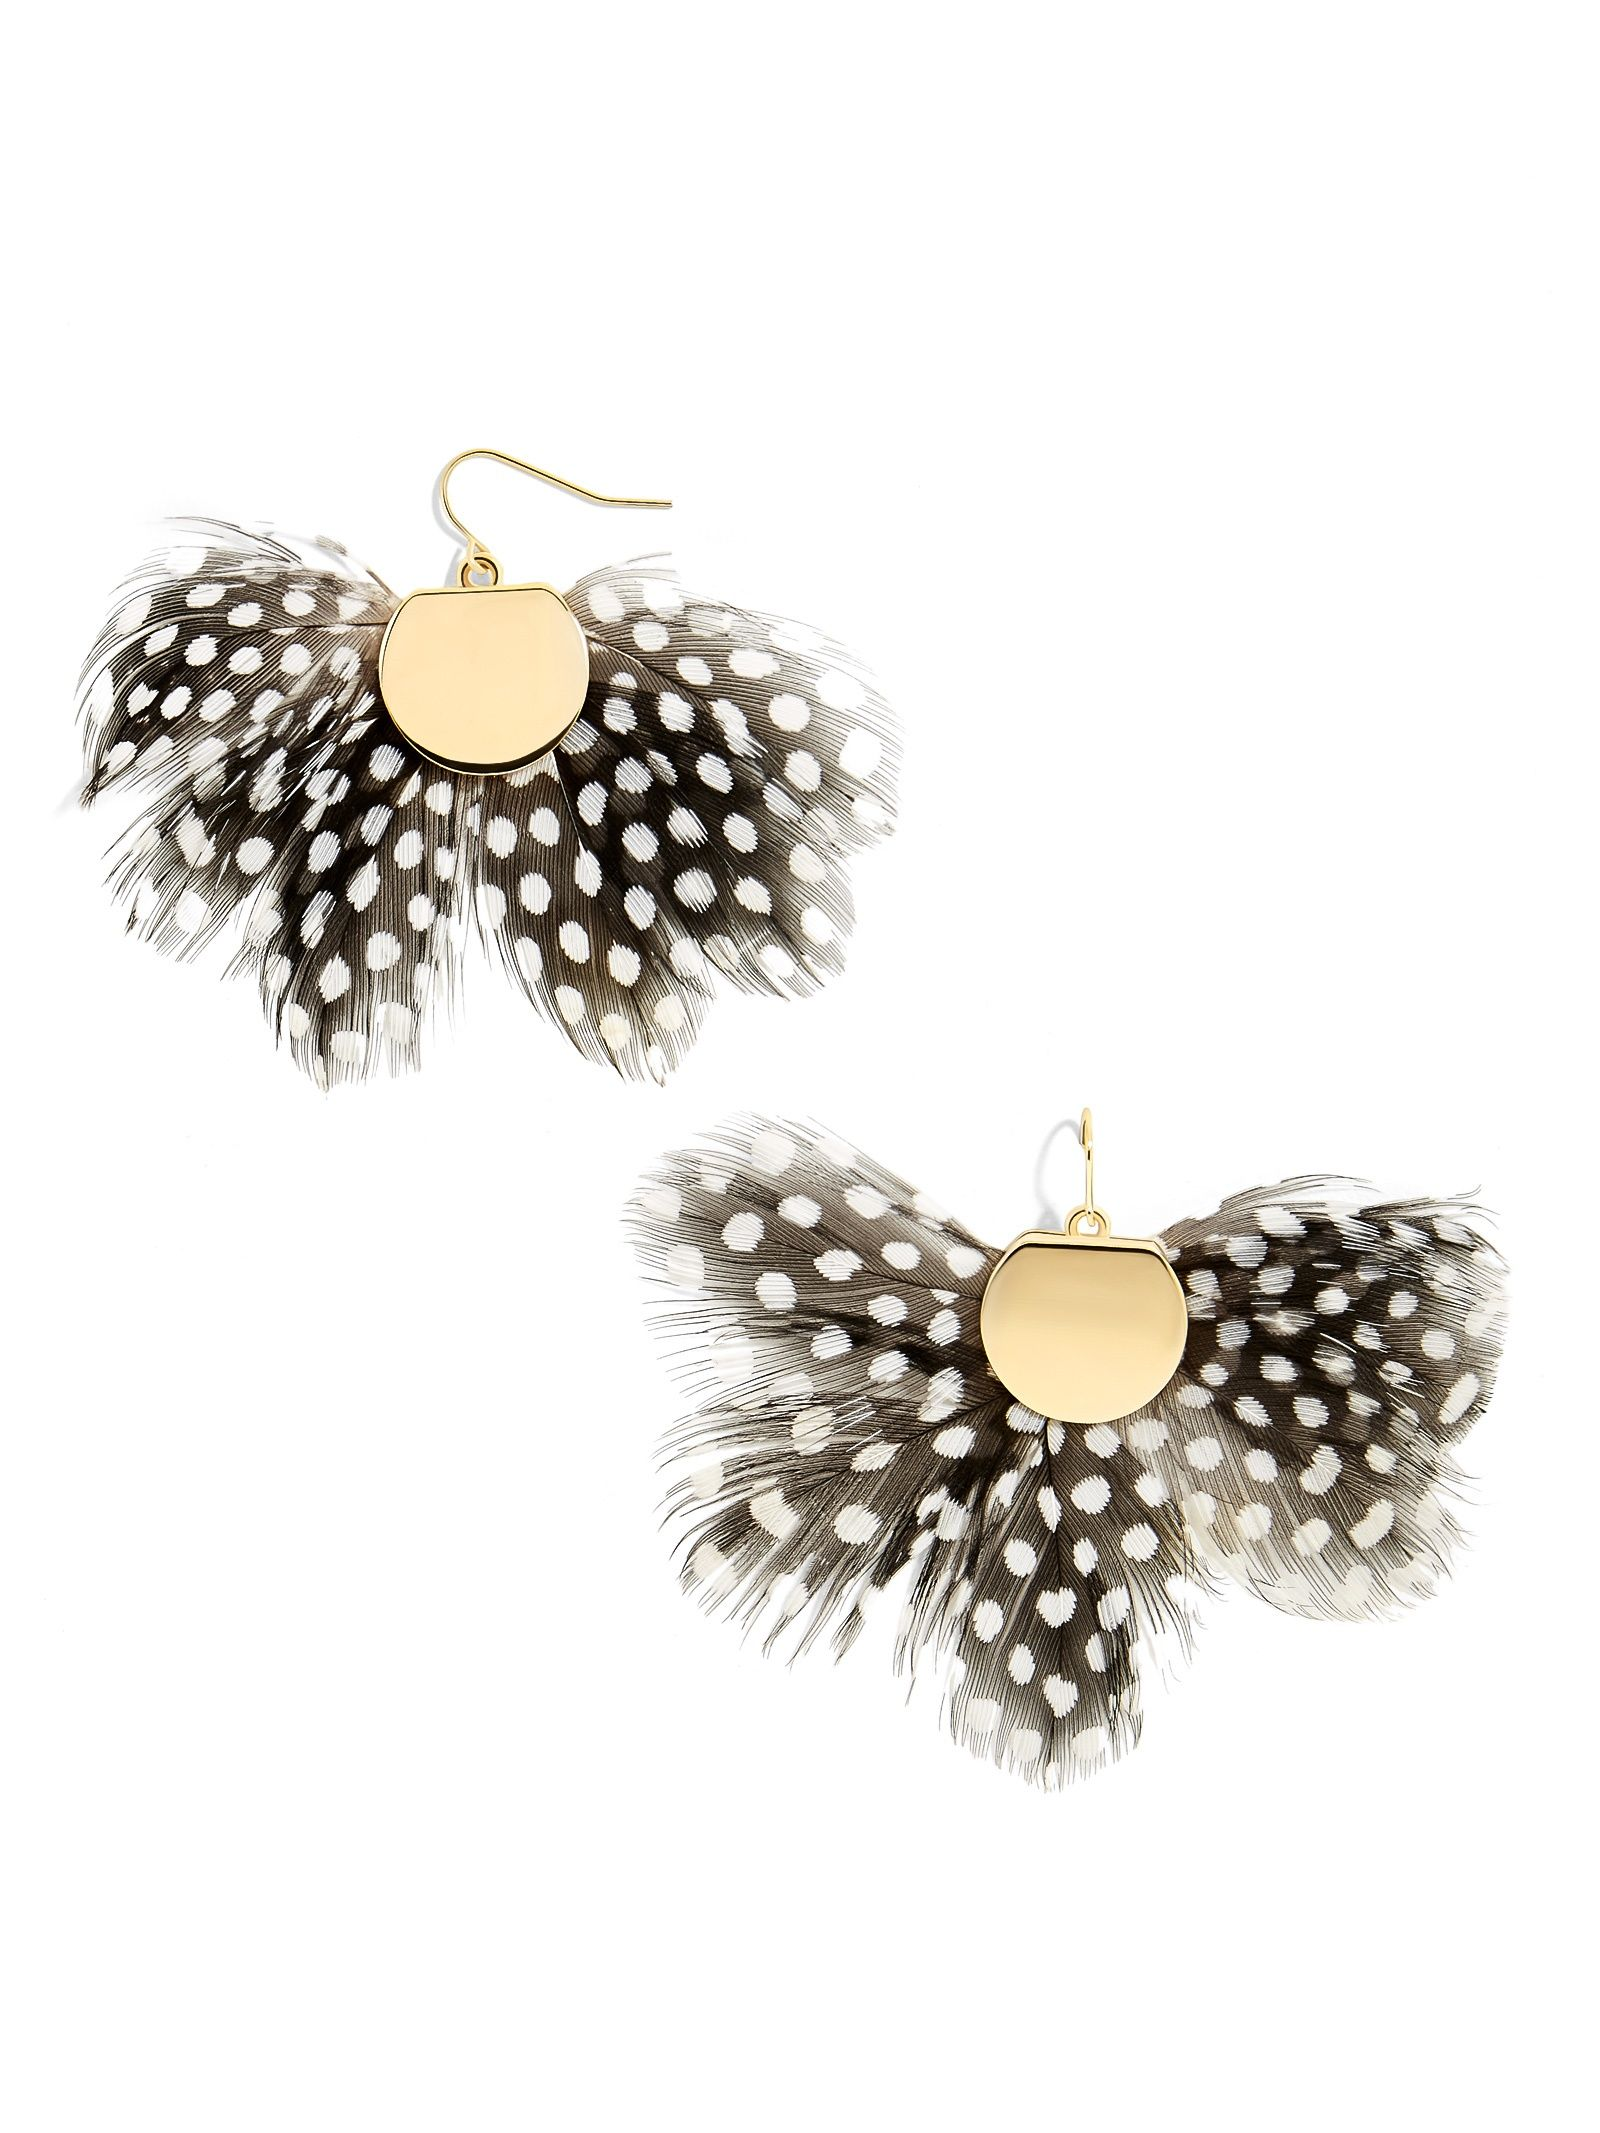 Monarch feather earrings feathers jewel and drop earrings